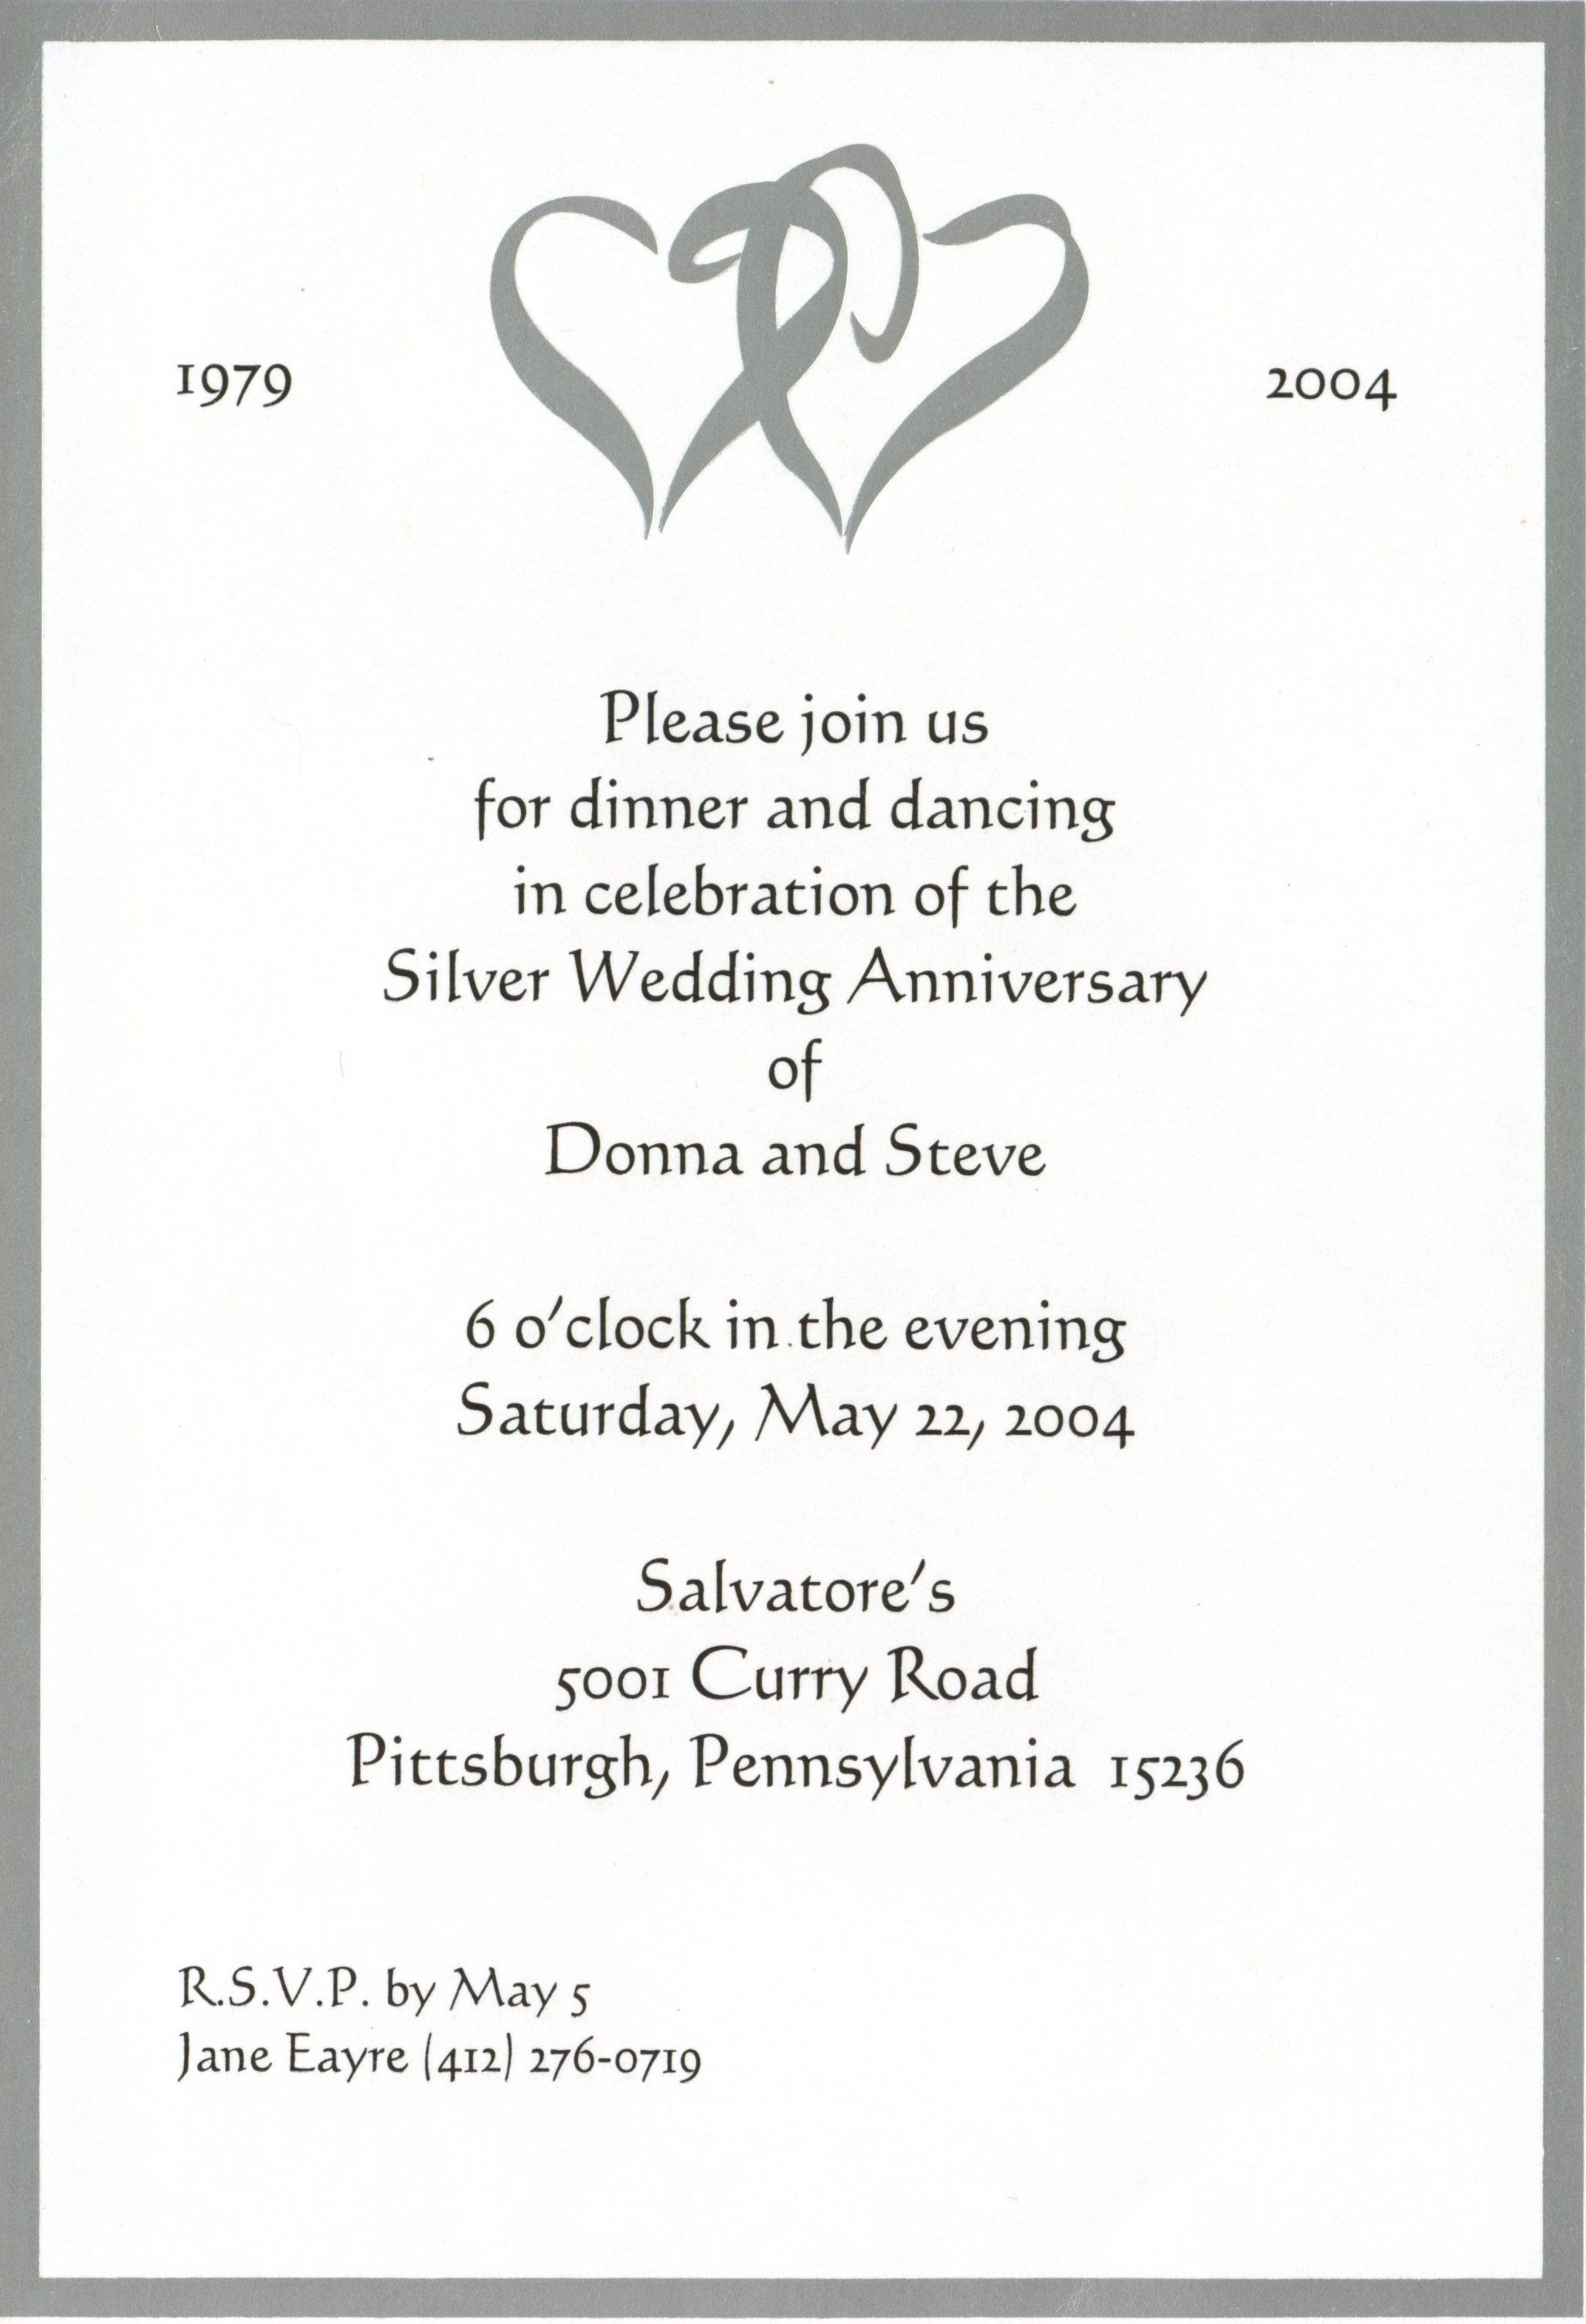 Spanish Wedding Invitation Wording Marina Gallery Fine Art Wedding Anniversary Invitations 25th Wedding Anniversary Invitations 50th Wedding Anniversary Invitations